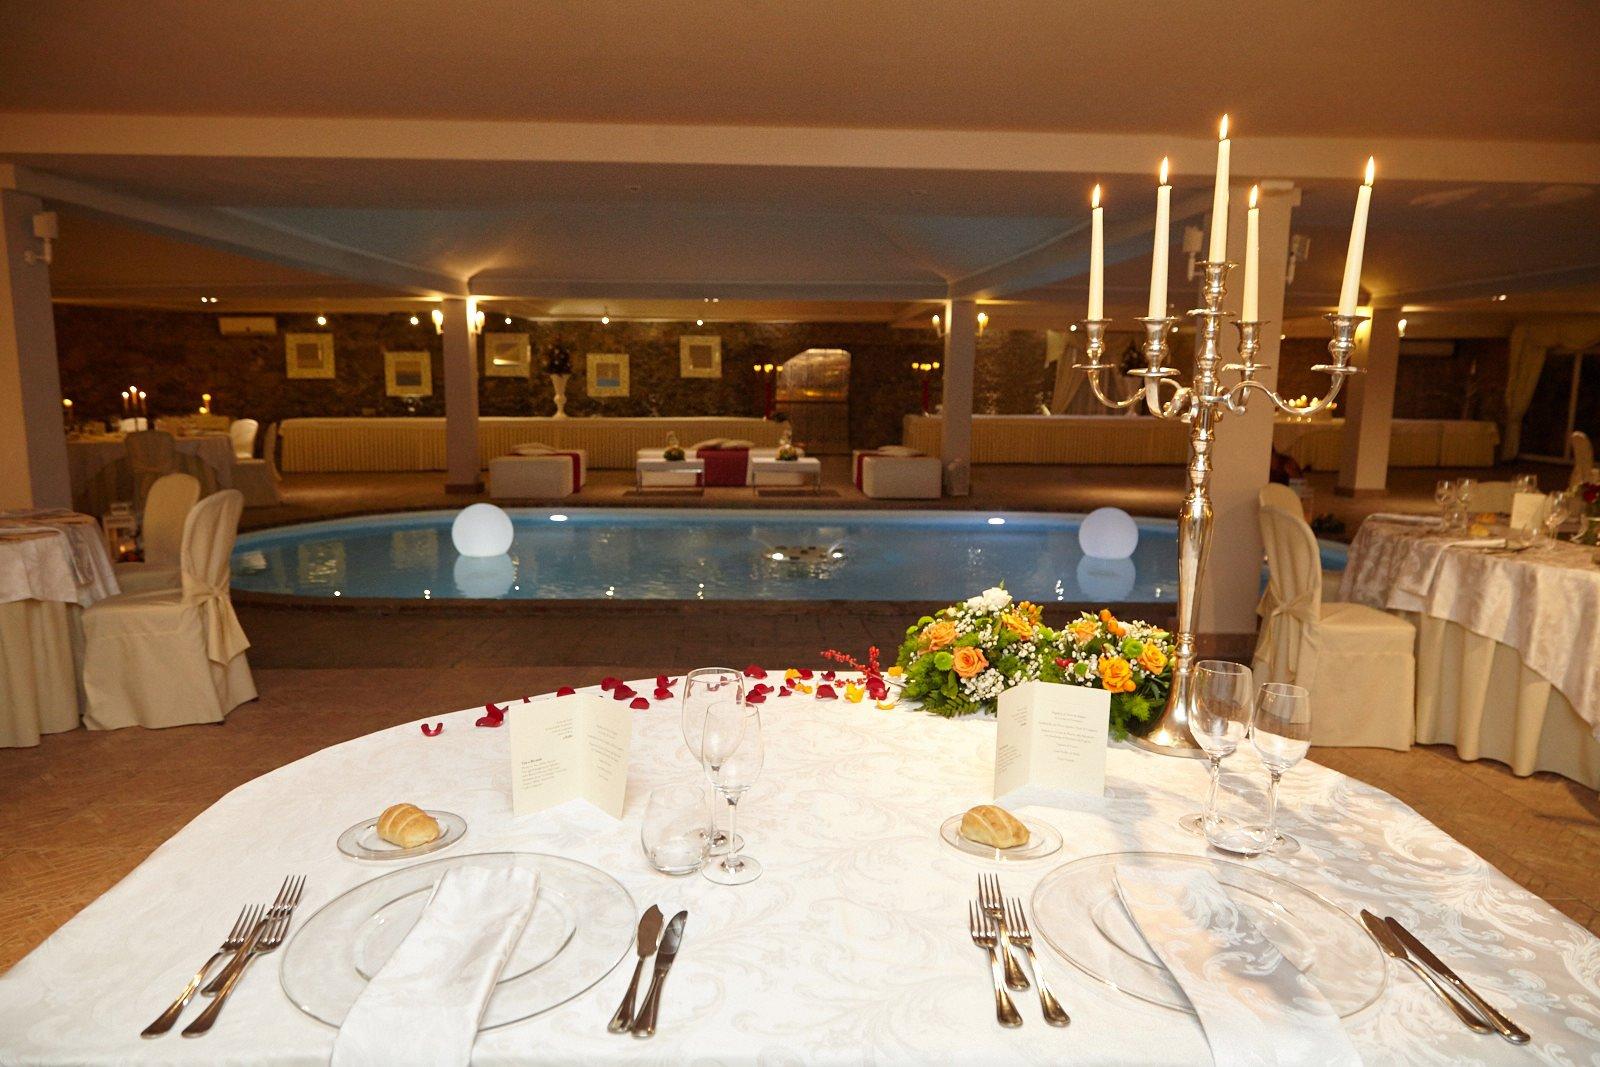 Ricevimenti e Matrimoni Roma Villa Grant - Sala Piscina